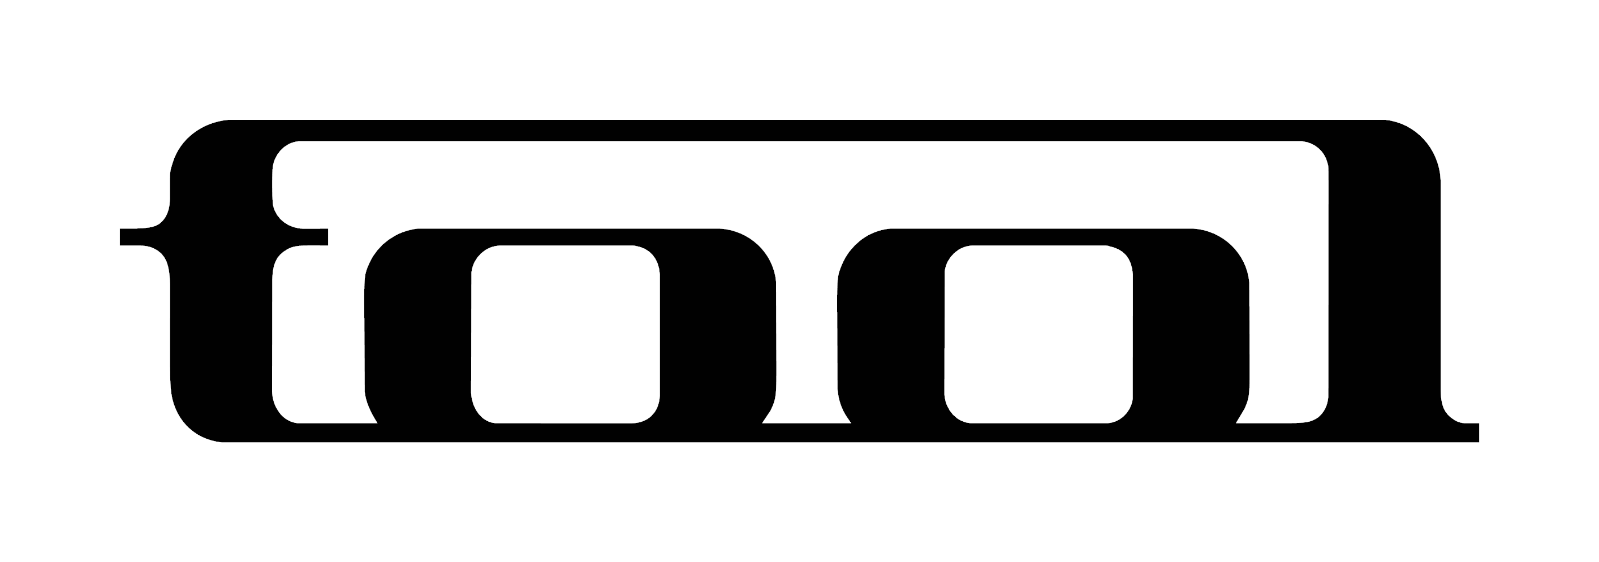 TOOL Die Cut Vinyl Decal, Car Truck Window Sticker phone roc